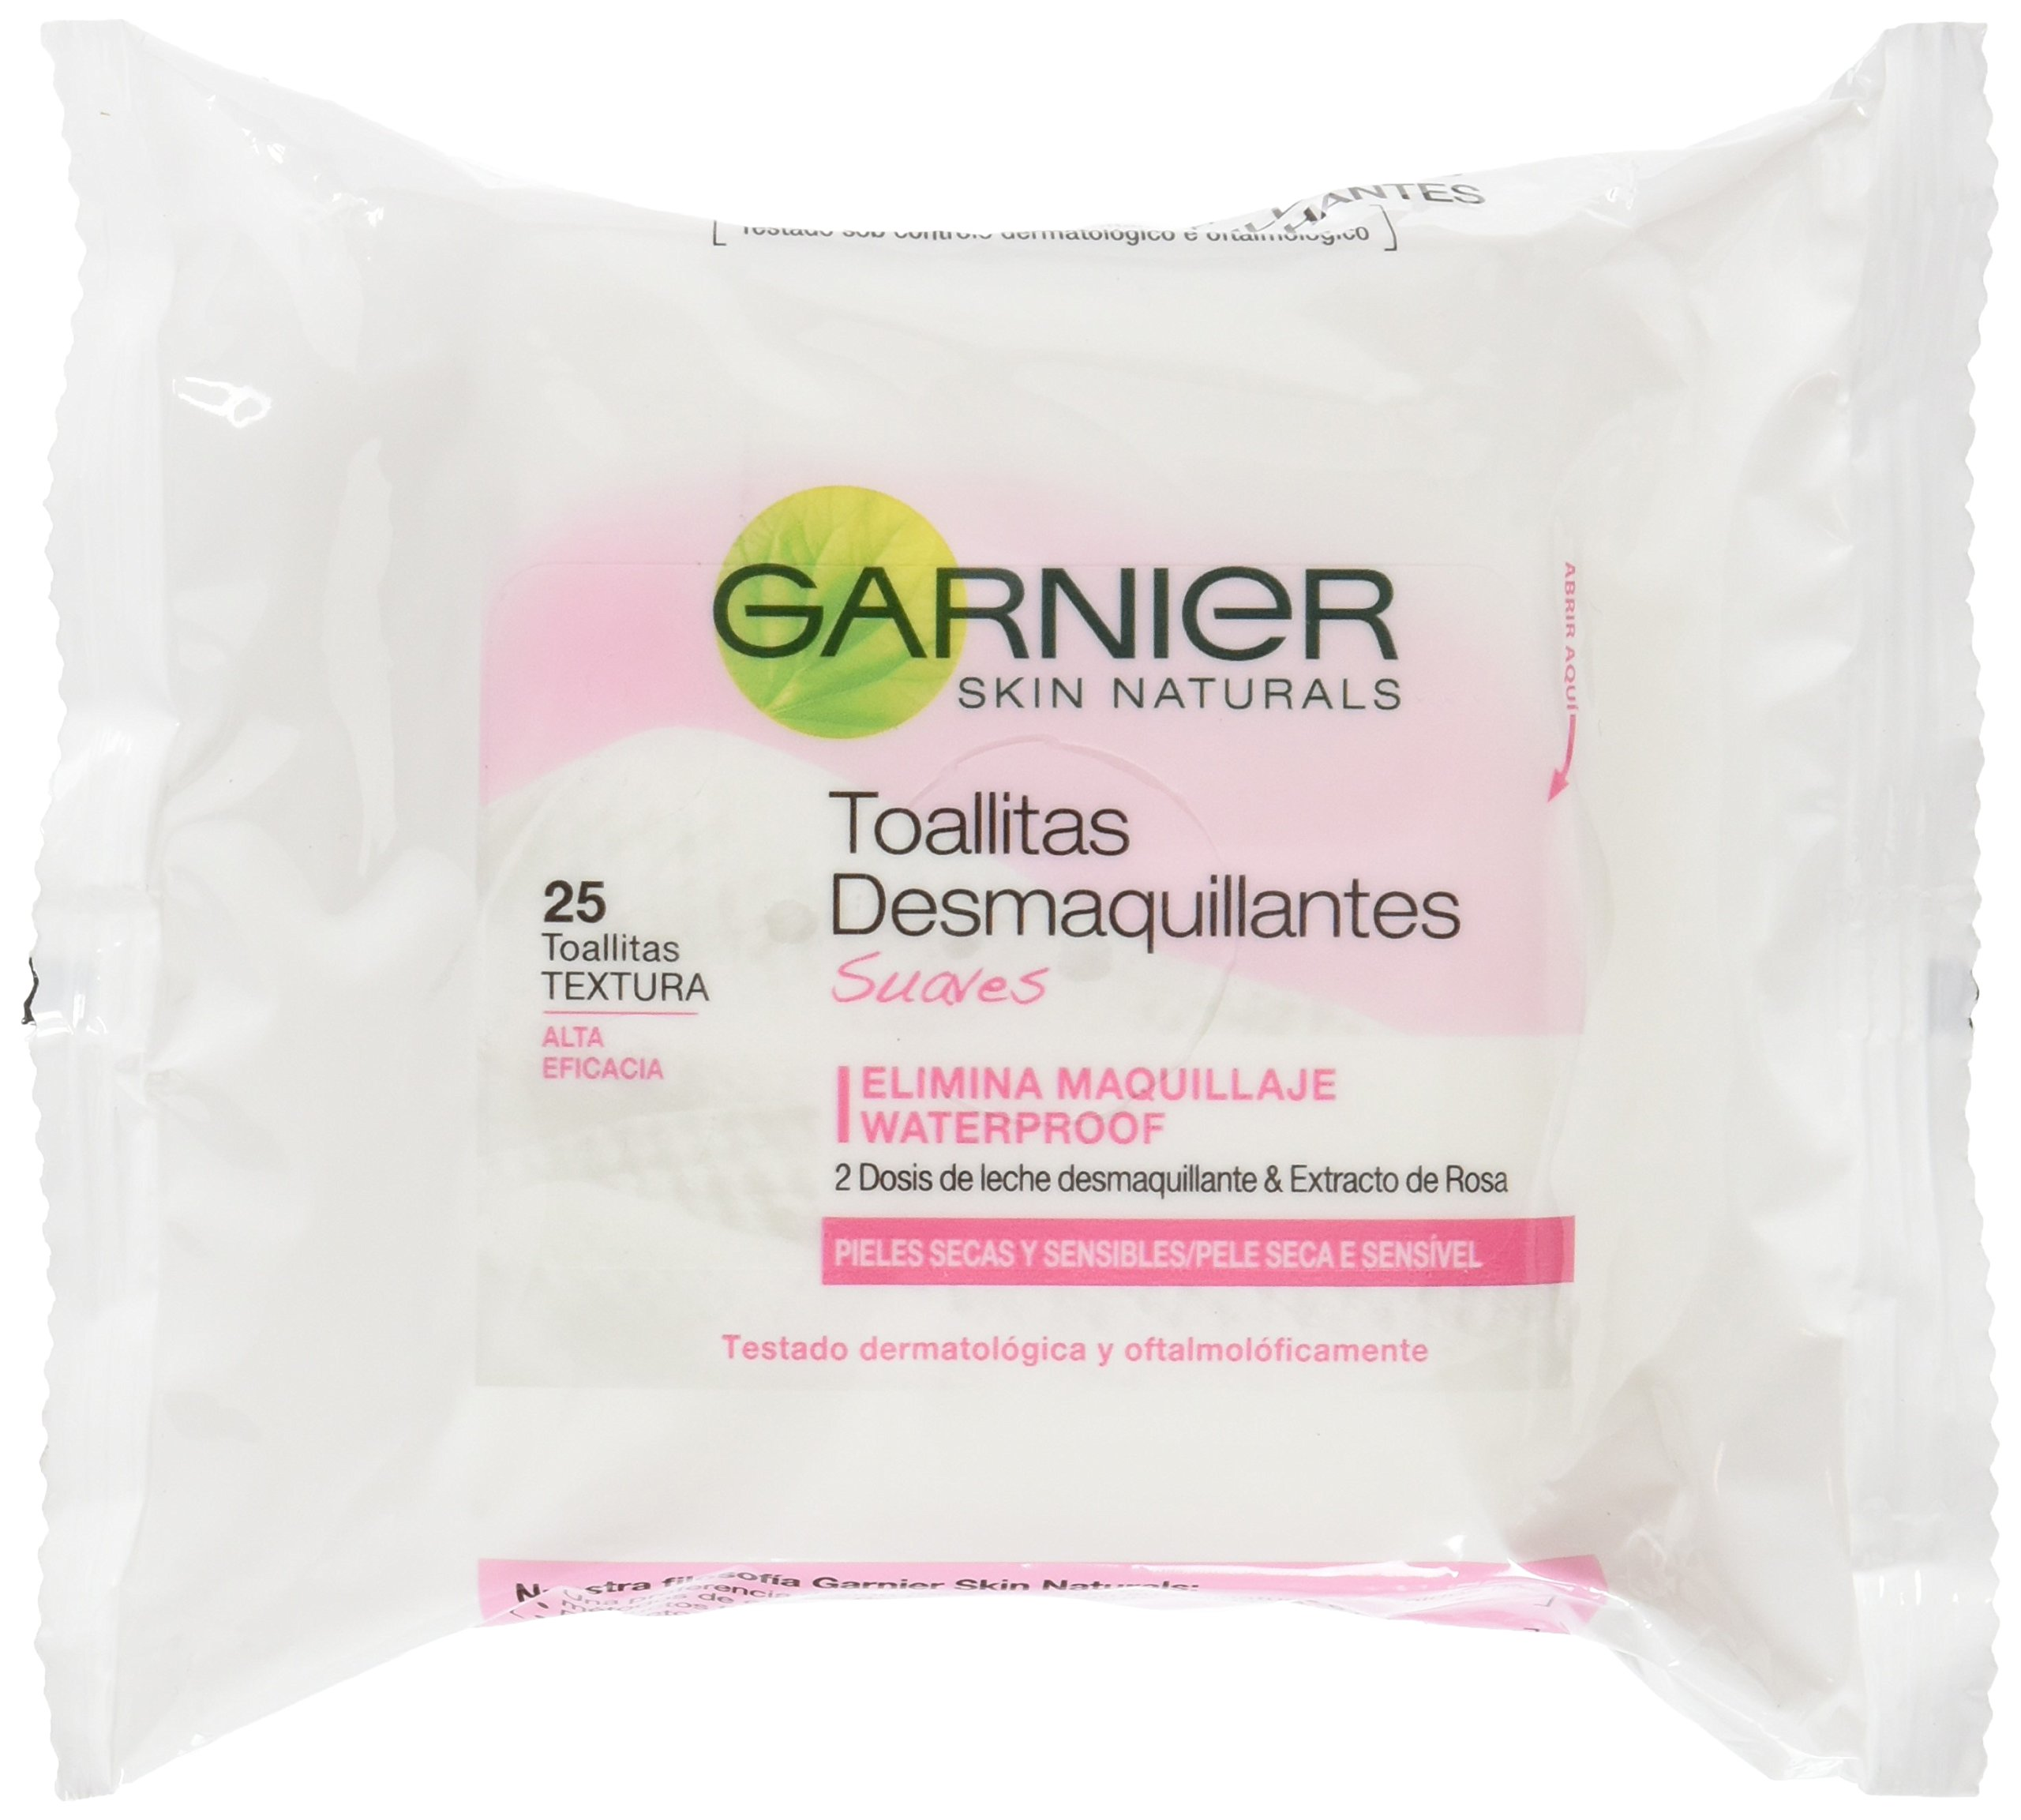 Garnier Skinactive – Toallitas Desmaquillantes Suaves, Pack 25, Total 50 Toallitas